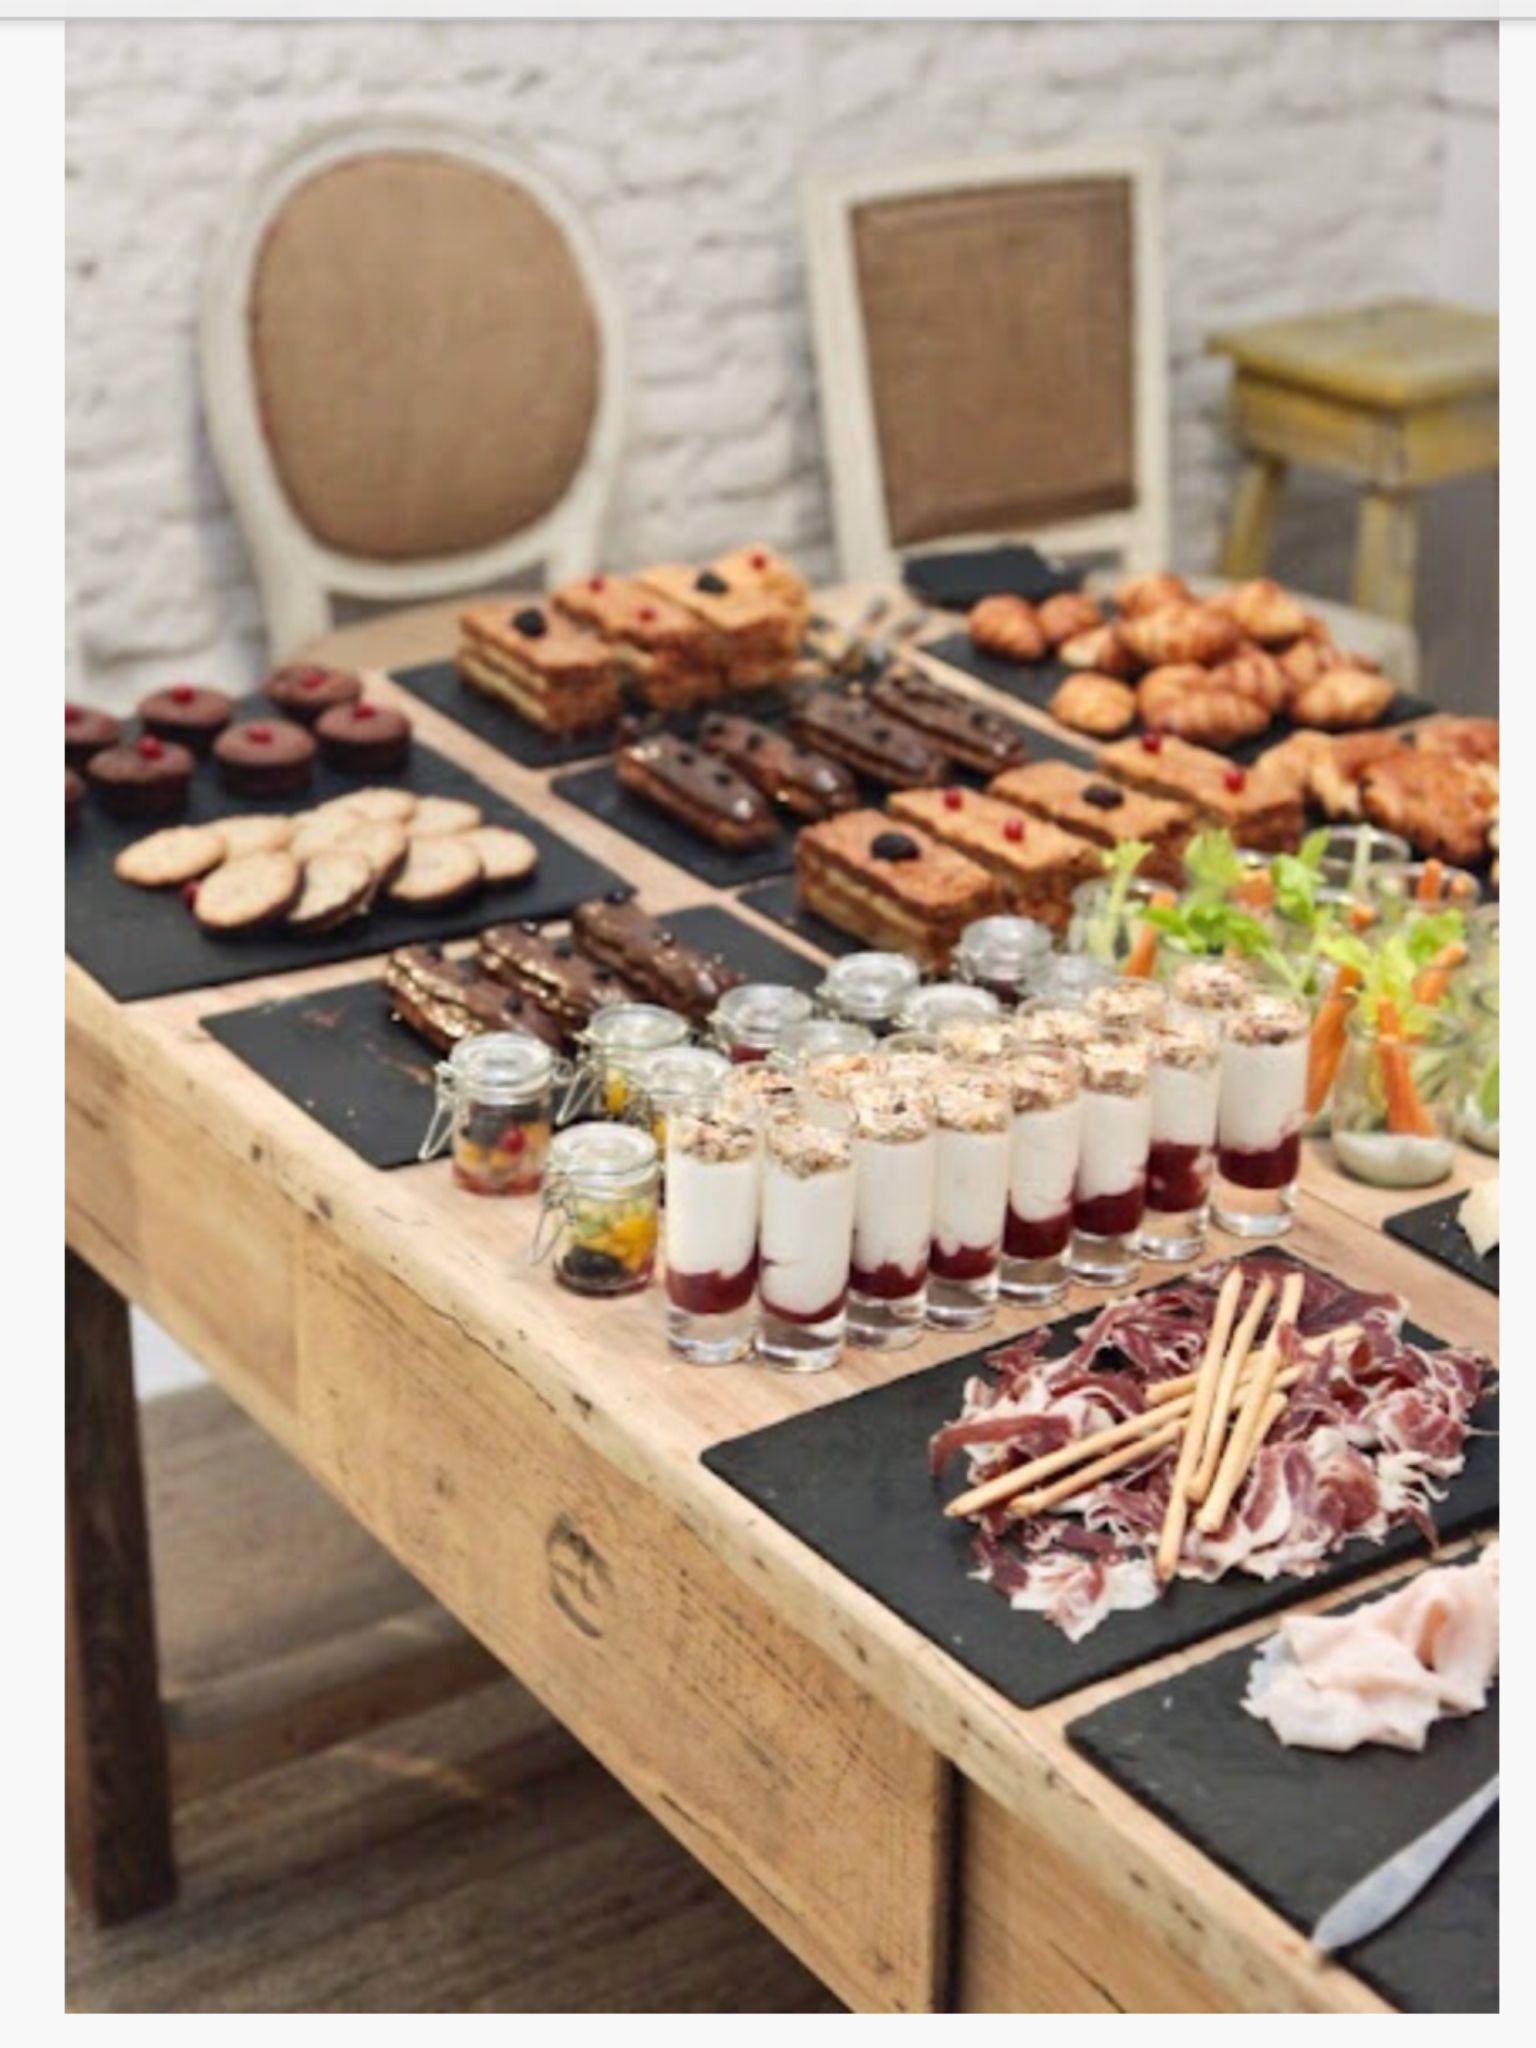 casero fete pinterest catering food and food ideas. Black Bedroom Furniture Sets. Home Design Ideas